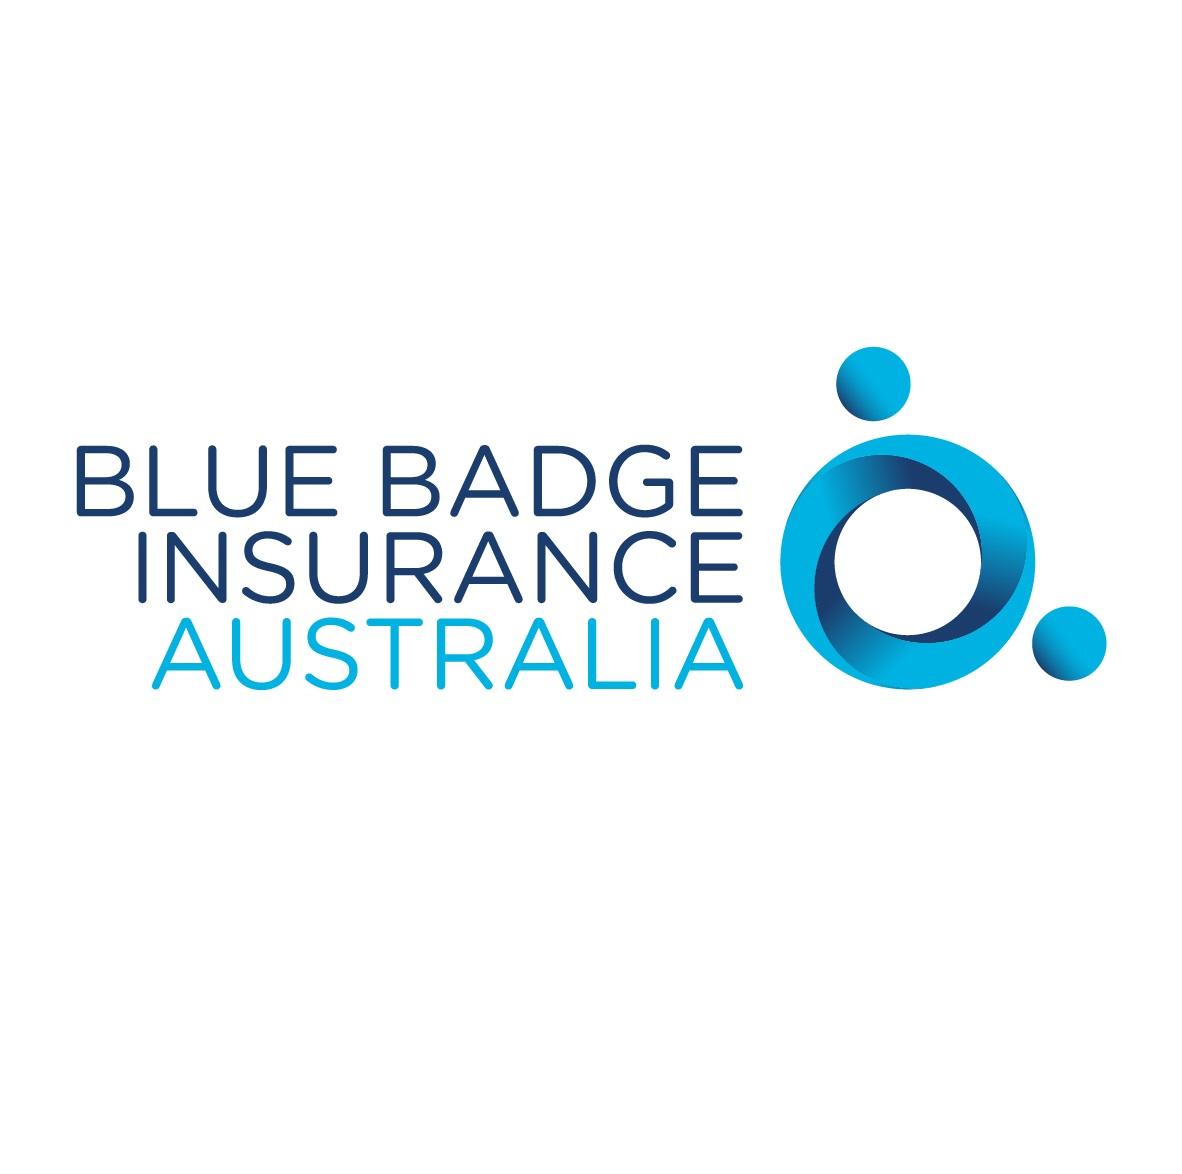 Blue Badge Insurance Australia